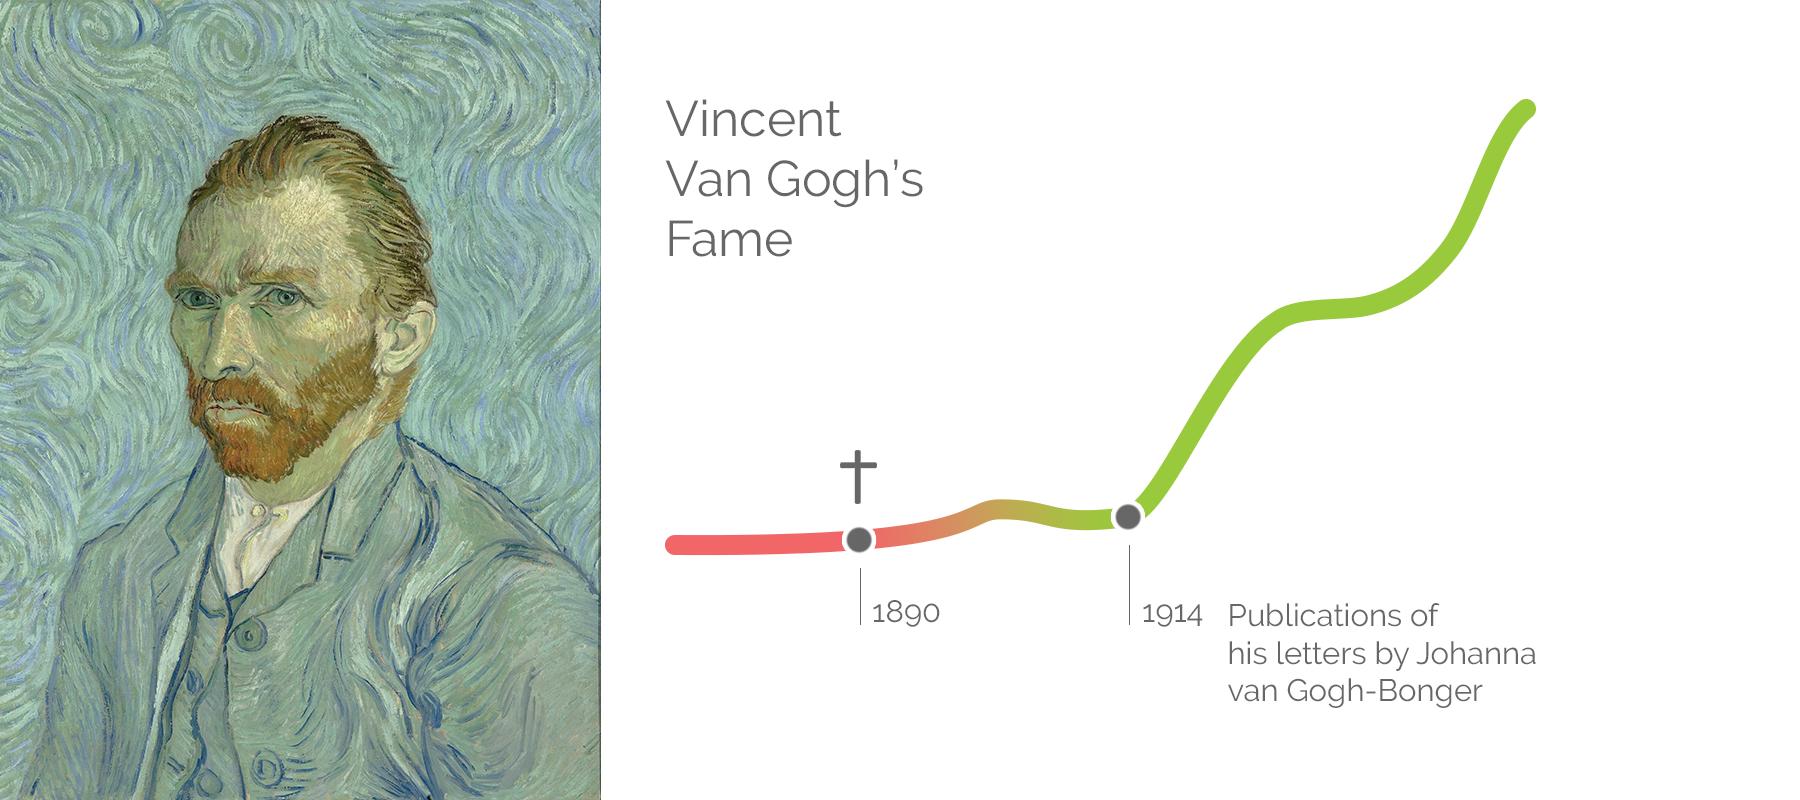 Inforgraphic: Vincent Van Gogh's Fame